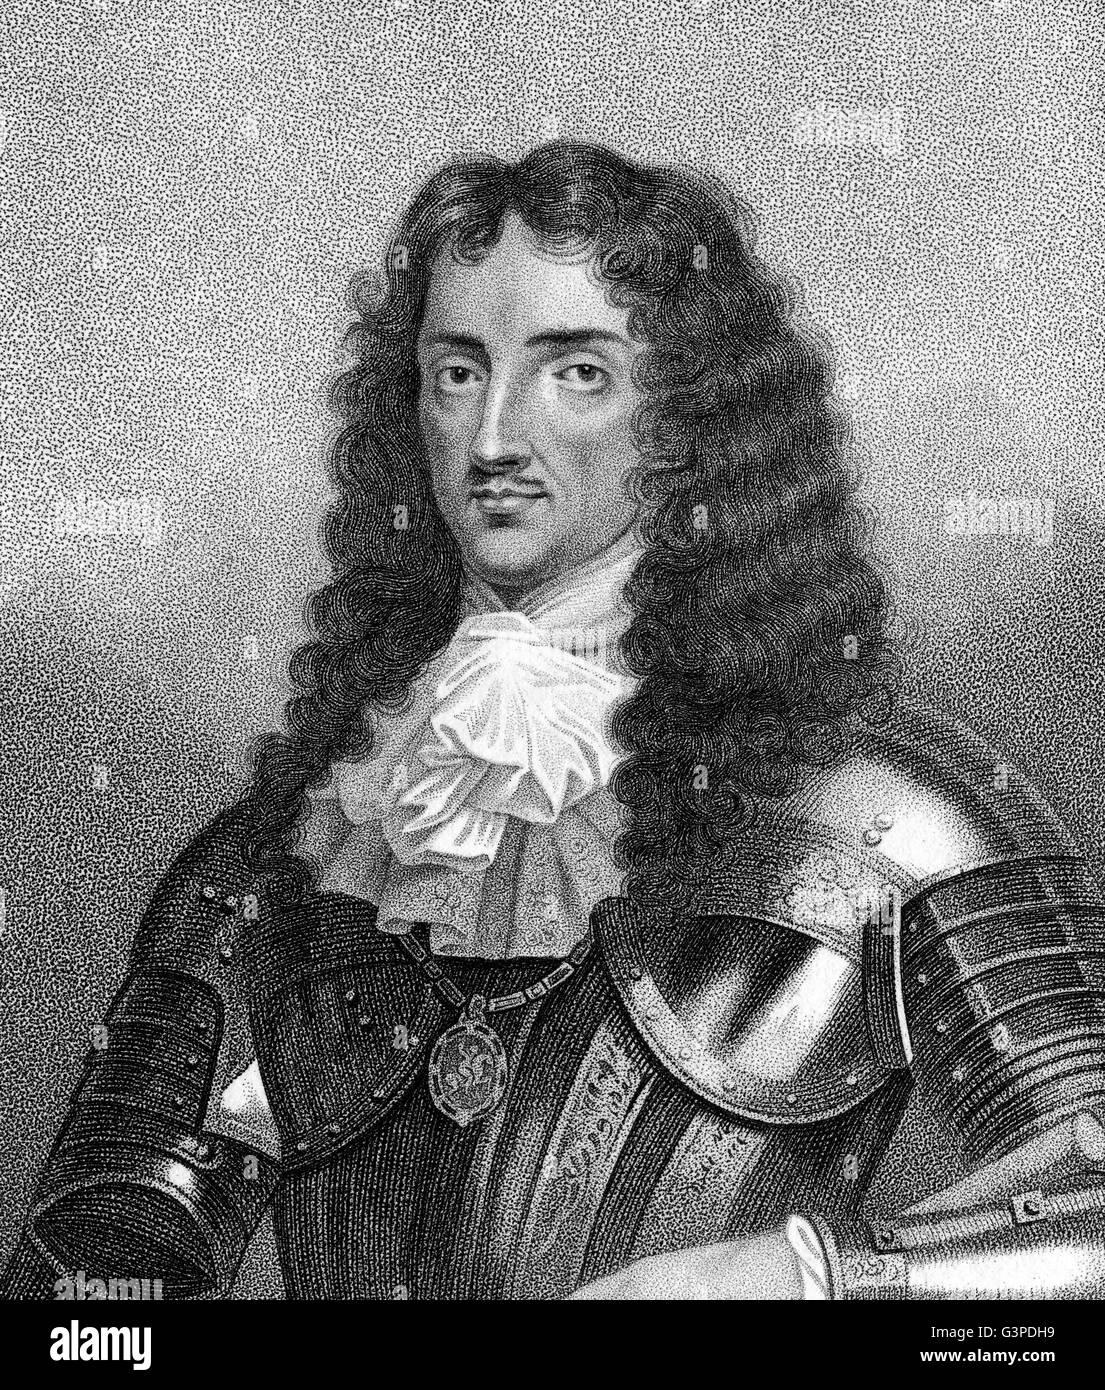 Charles II, 1630-1685, monarch of the three kingdoms of England, Scotland, and Ireland - Stock Image